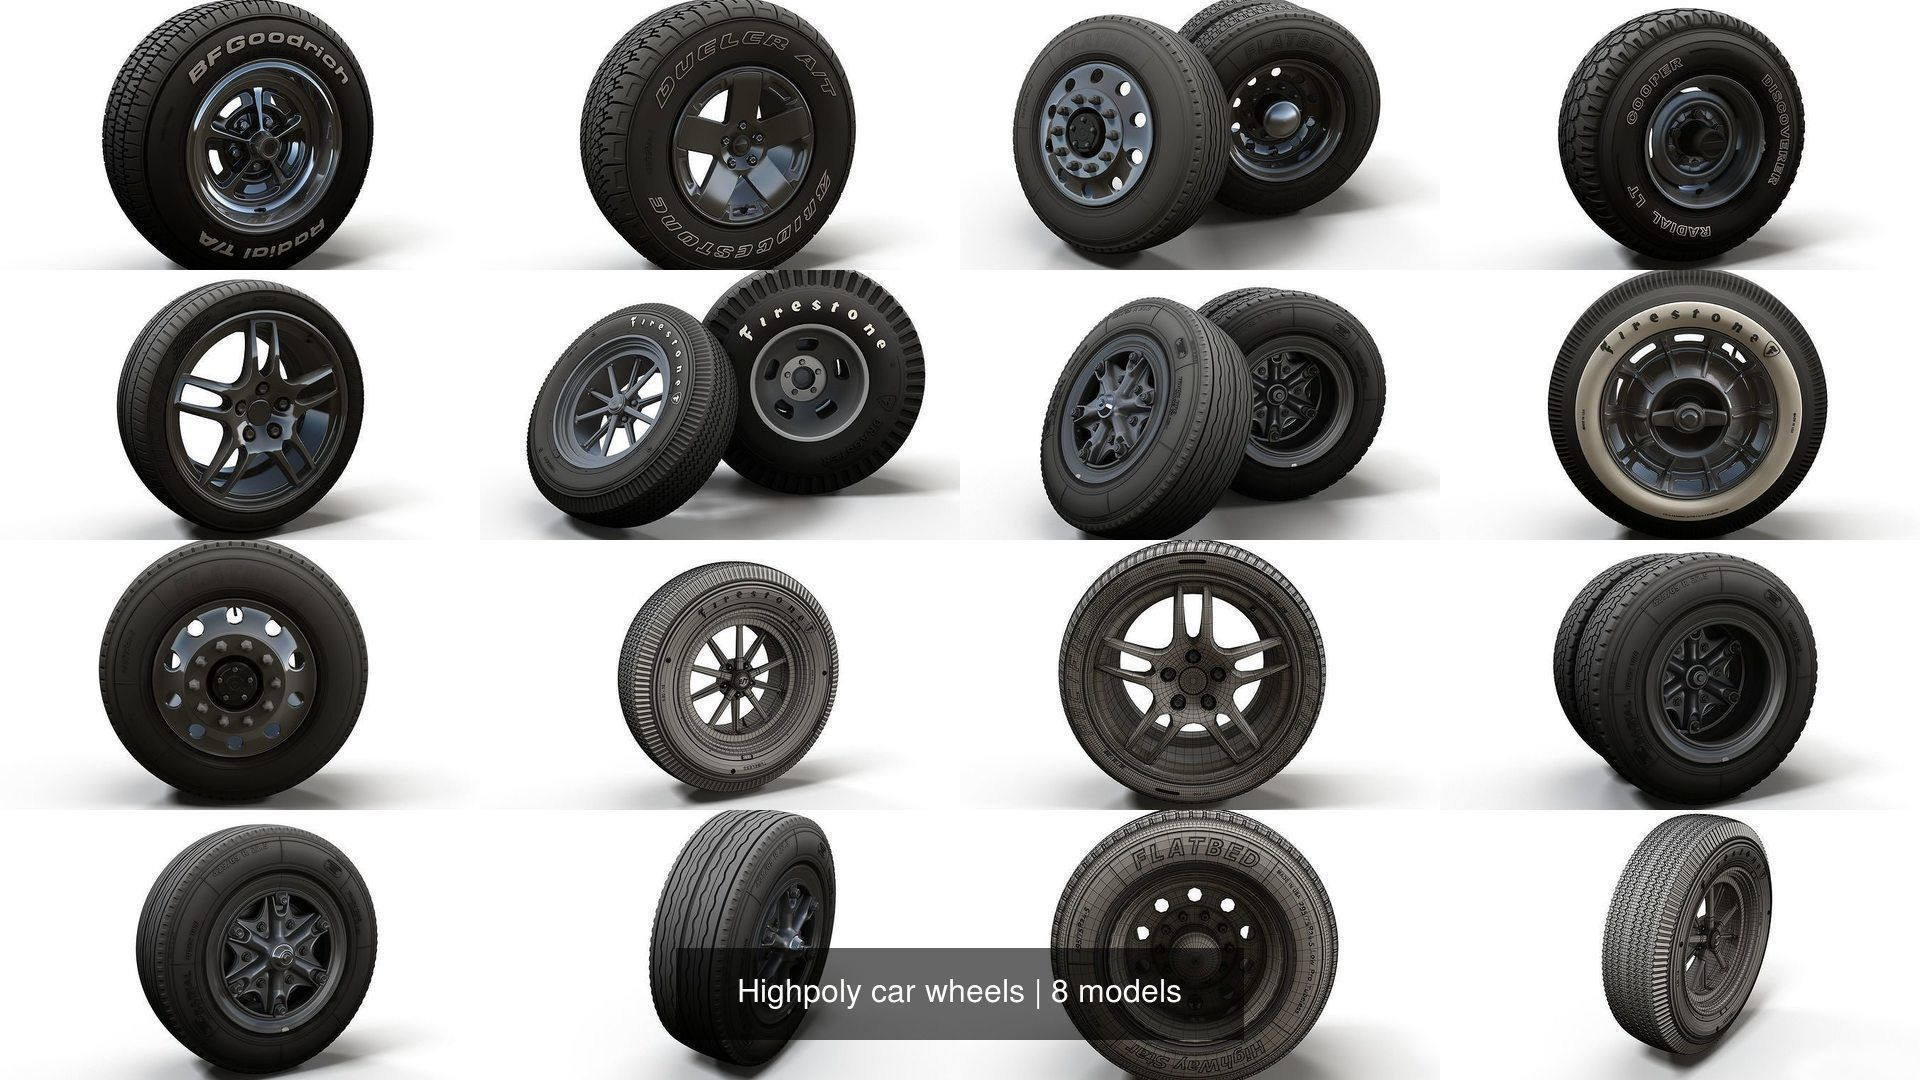 Highpoly car wheels